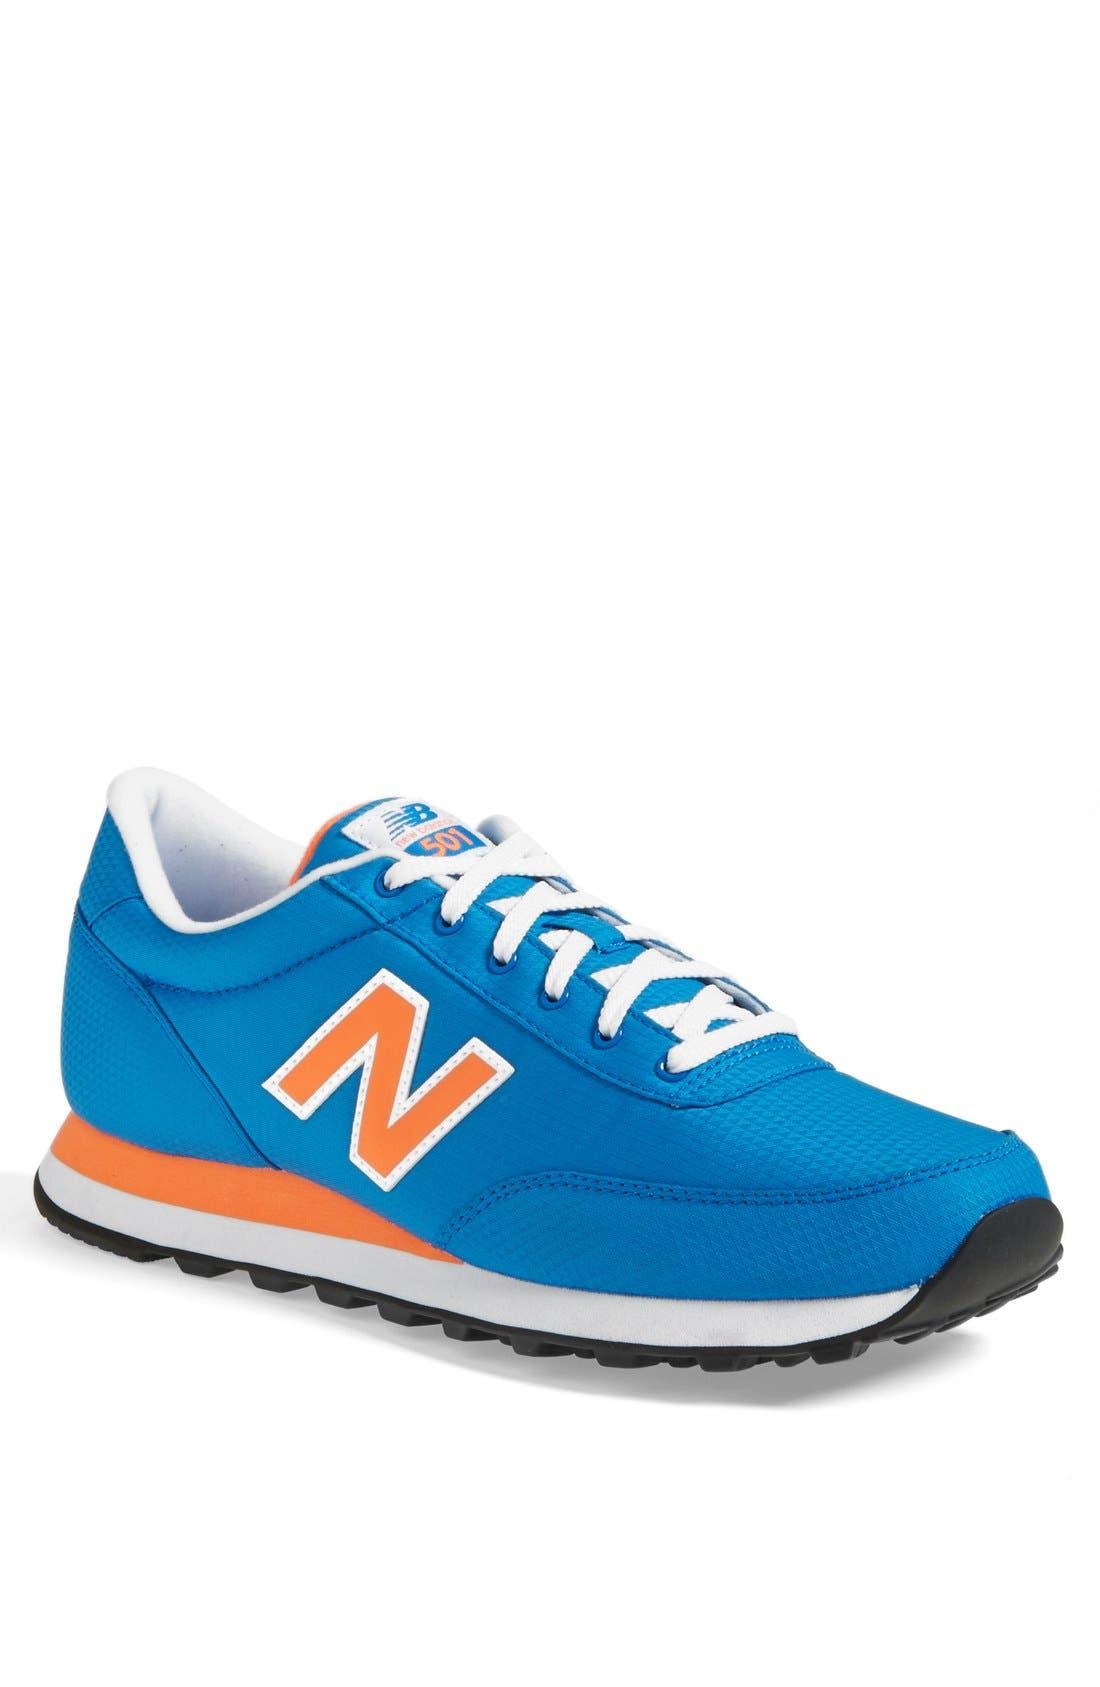 Main Image - New Balance '501' Sneaker (Men) (Online Only)